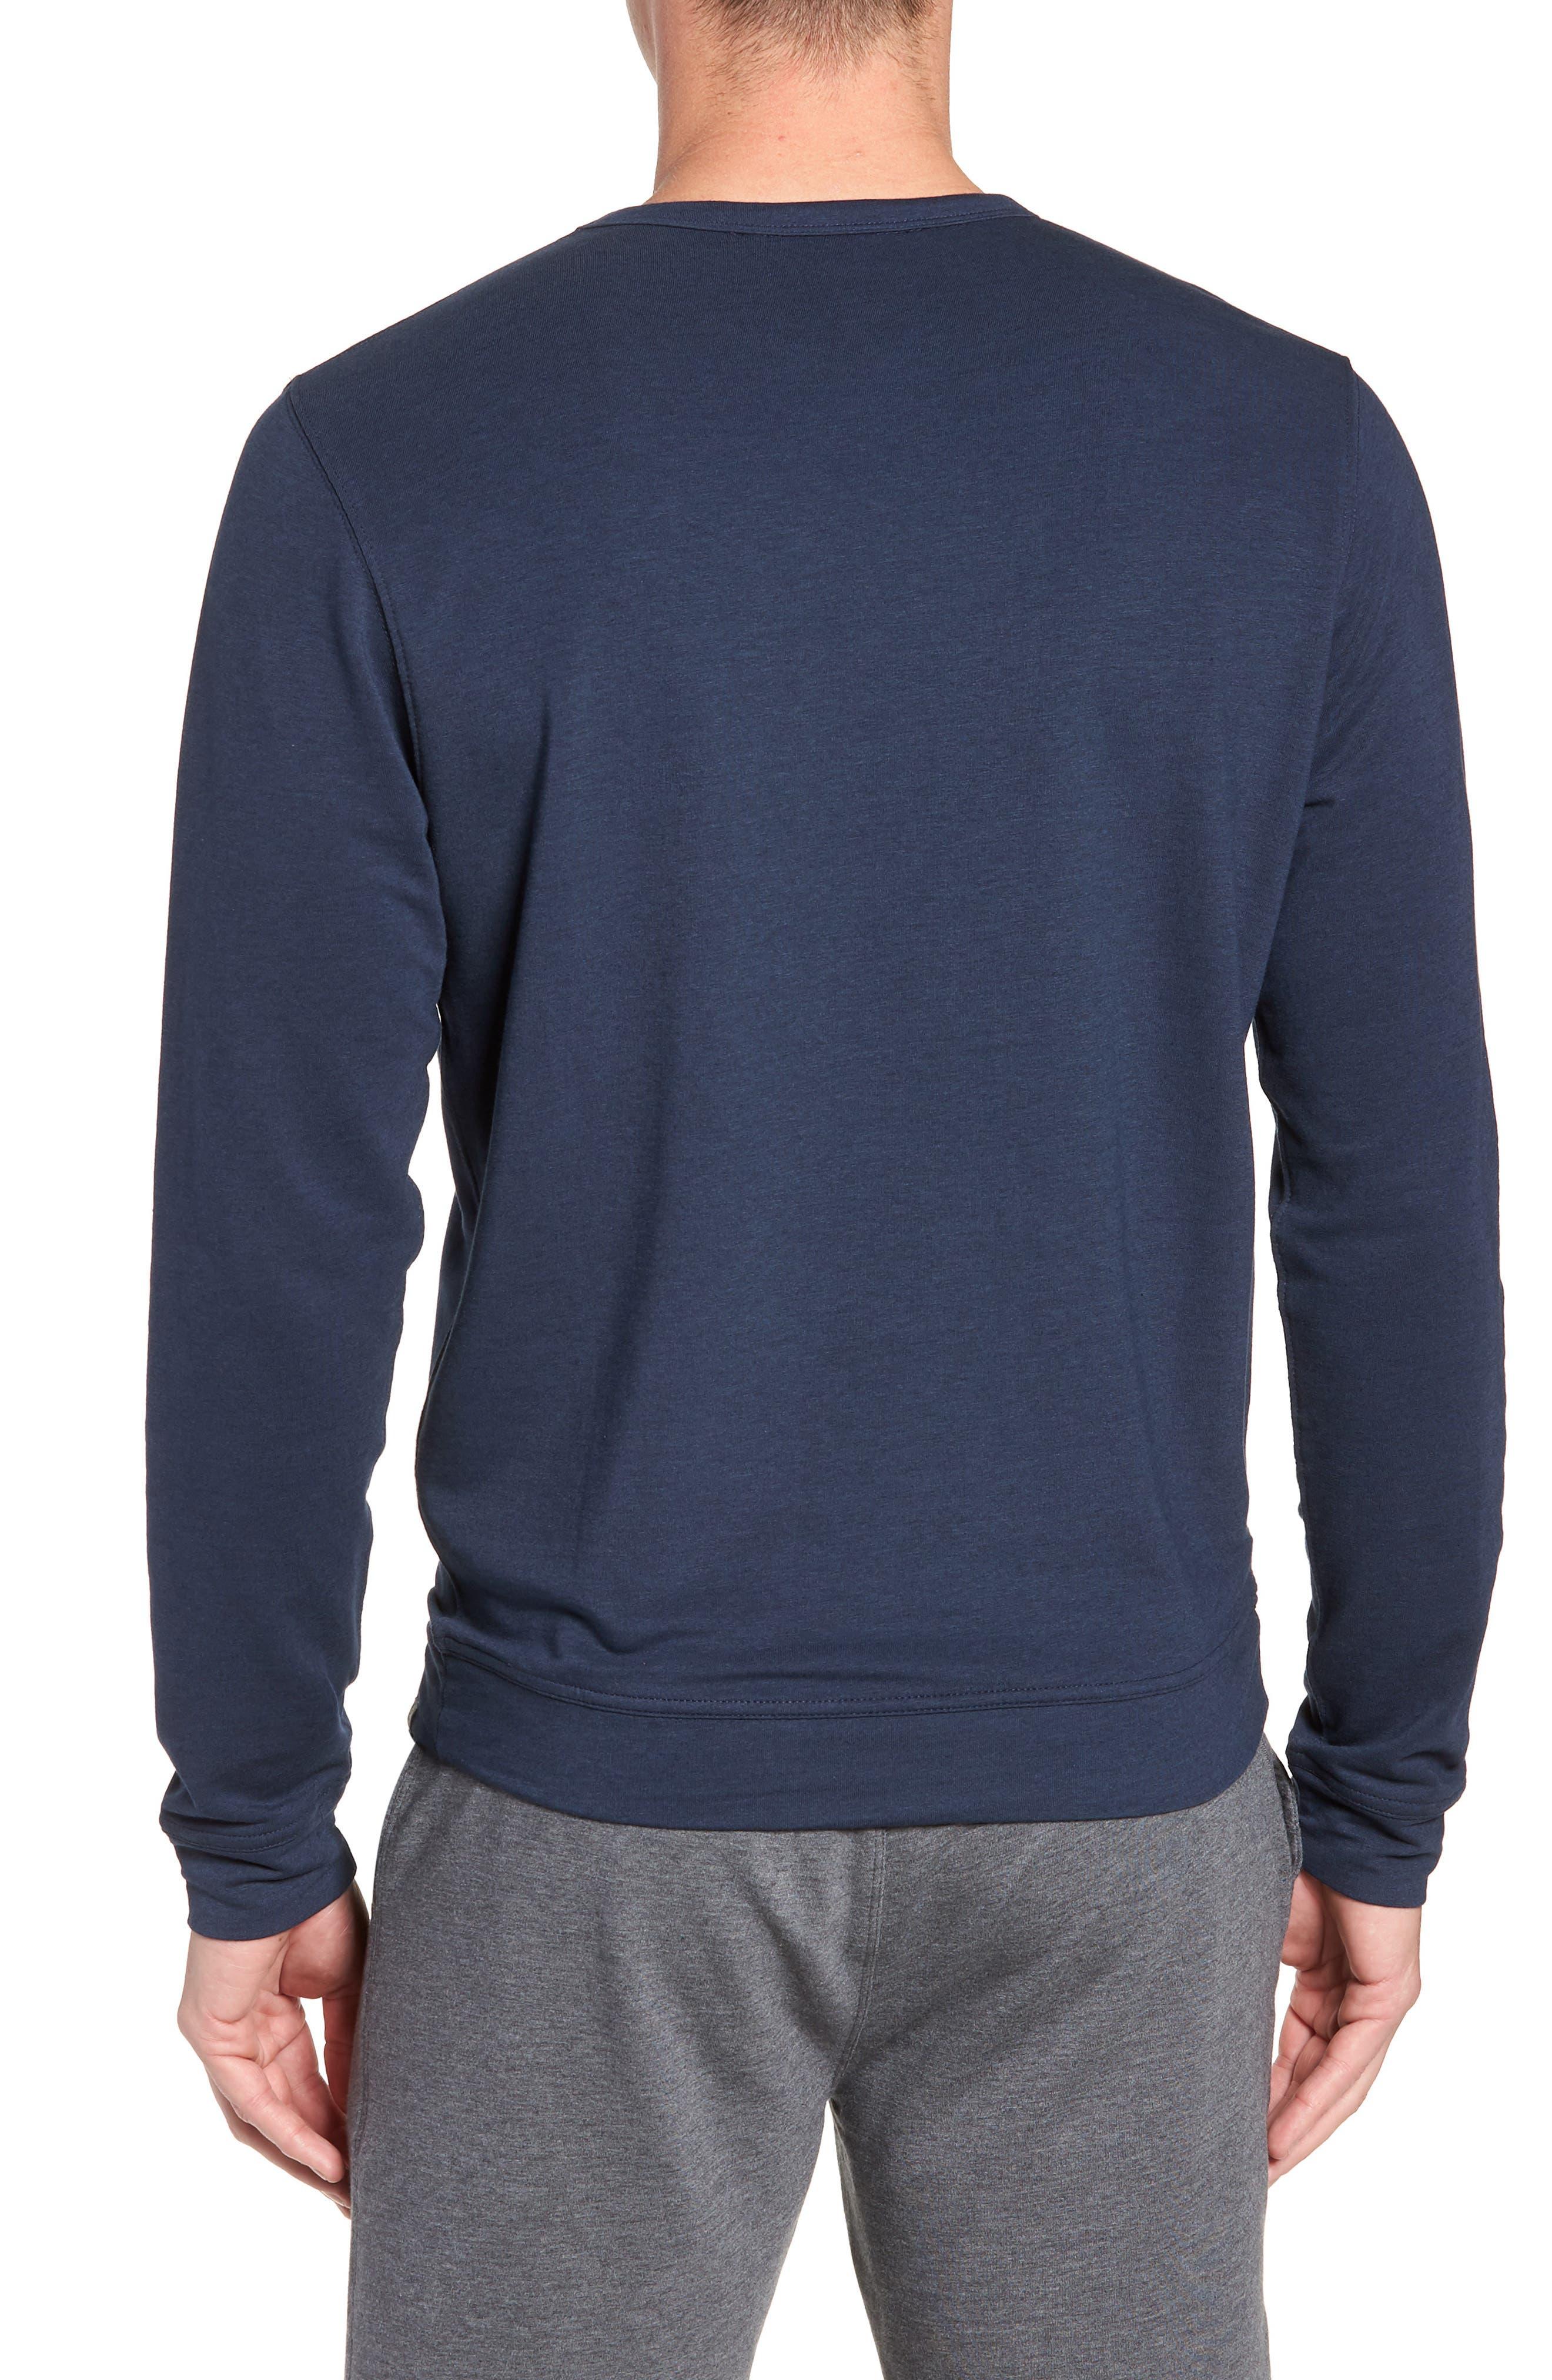 TASC PERFORMANCE, Legacy Crewneck Semi Fitted Sweatshirt, Alternate thumbnail 2, color, CLASSIC NAVY